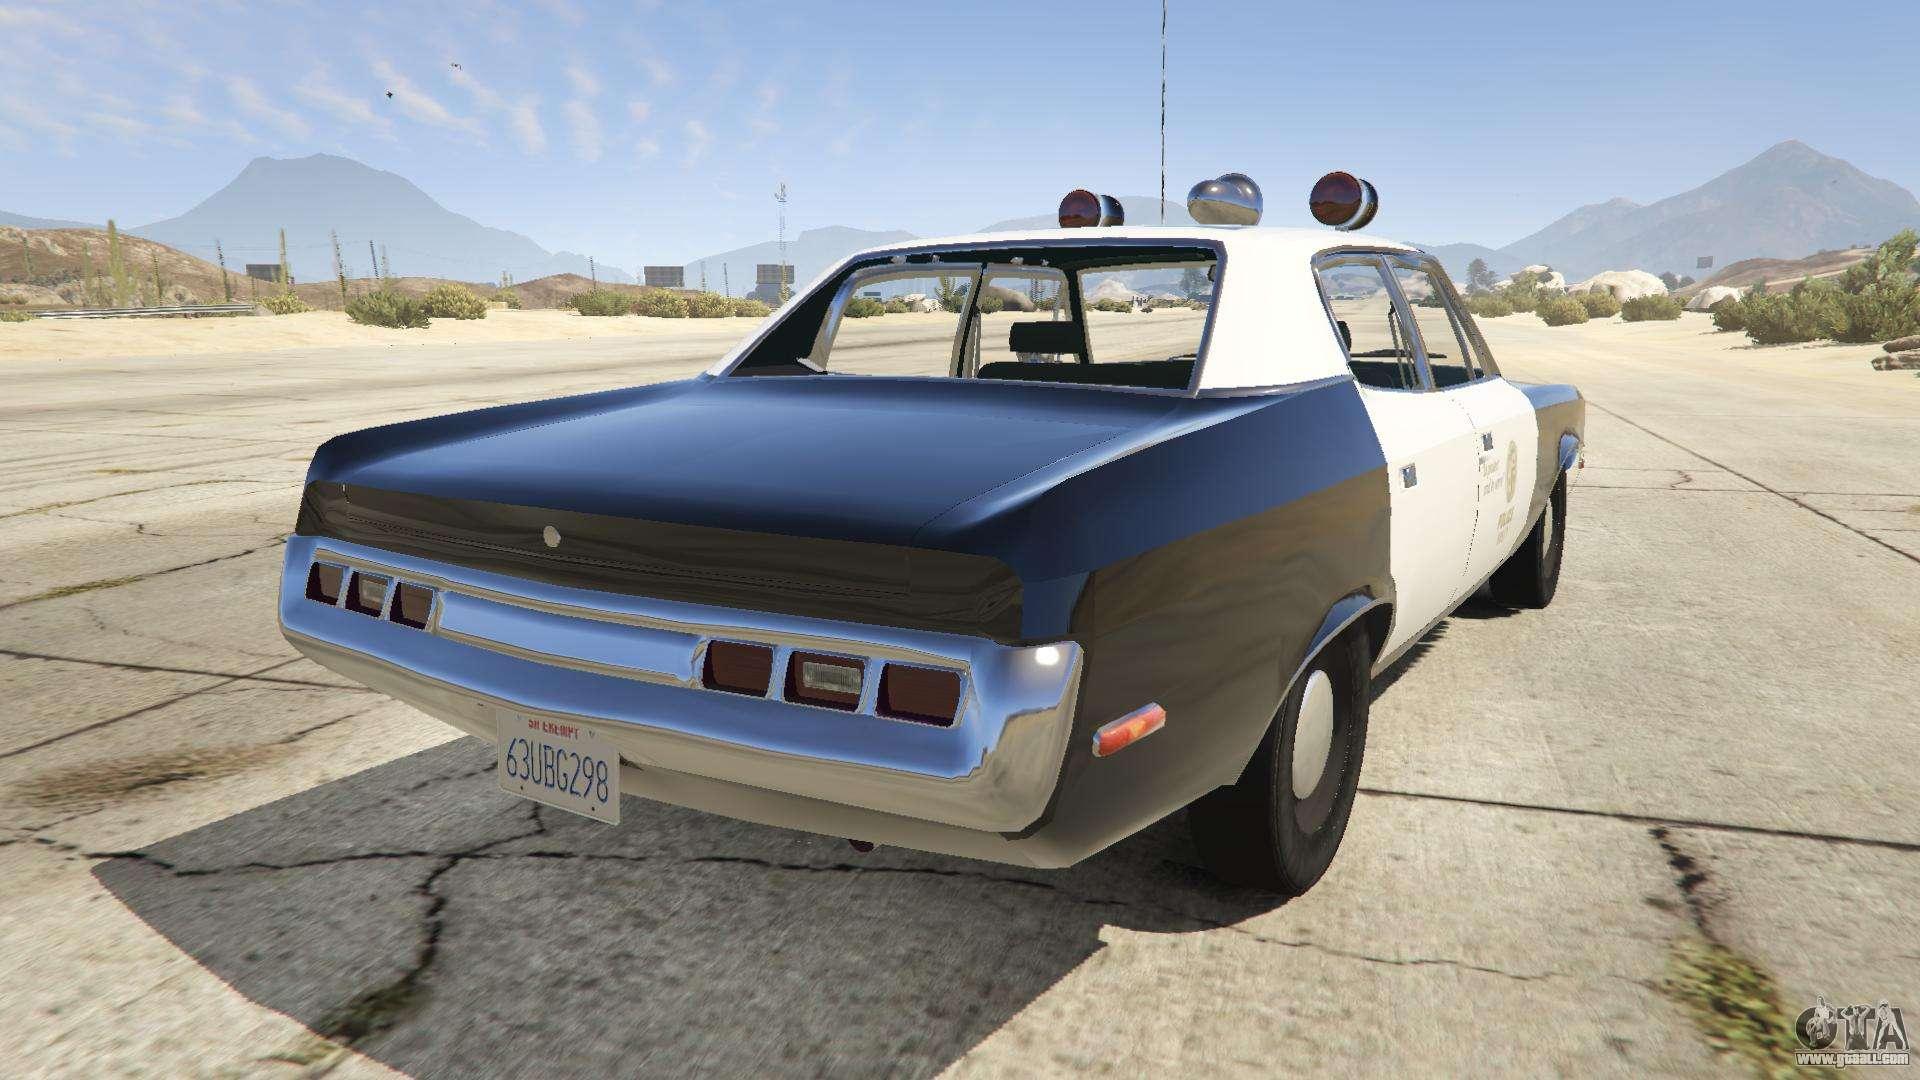 1972 AMC Matador LAPD for GTA 5 Gta 4 Pc Cars